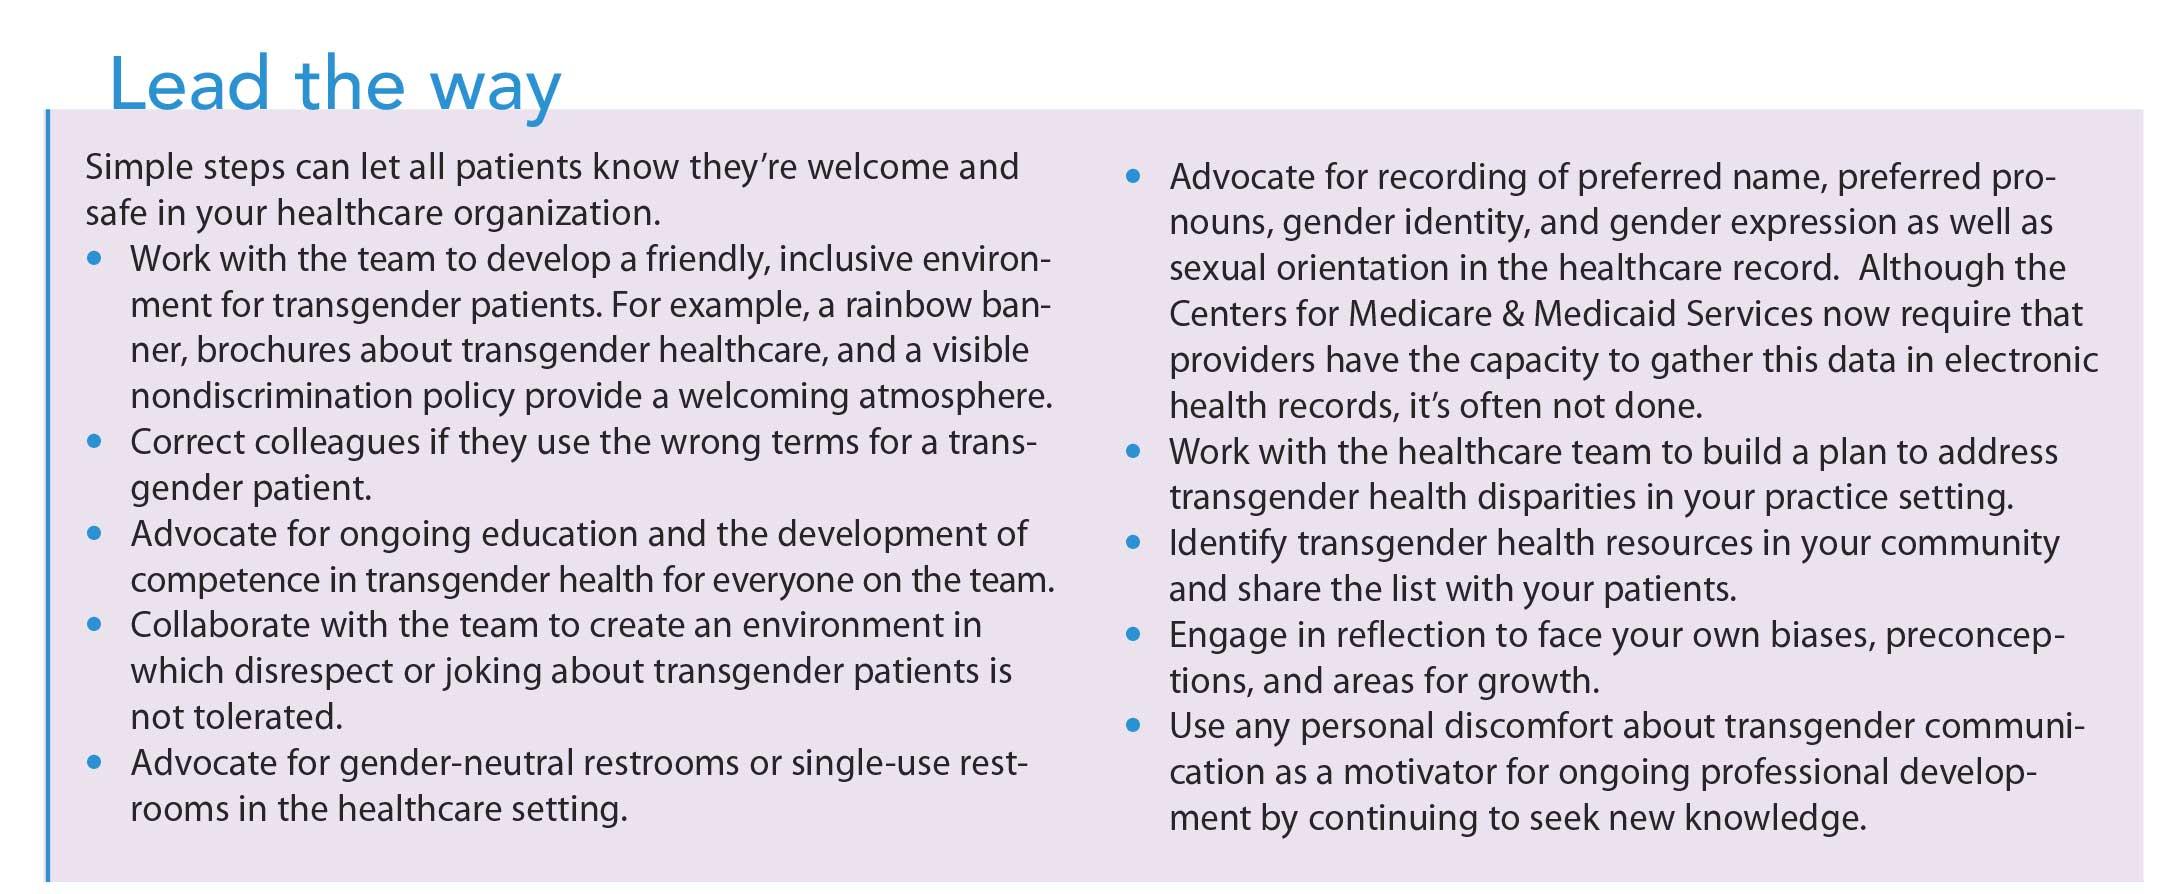 Nursing communication and the gender identity spectrum